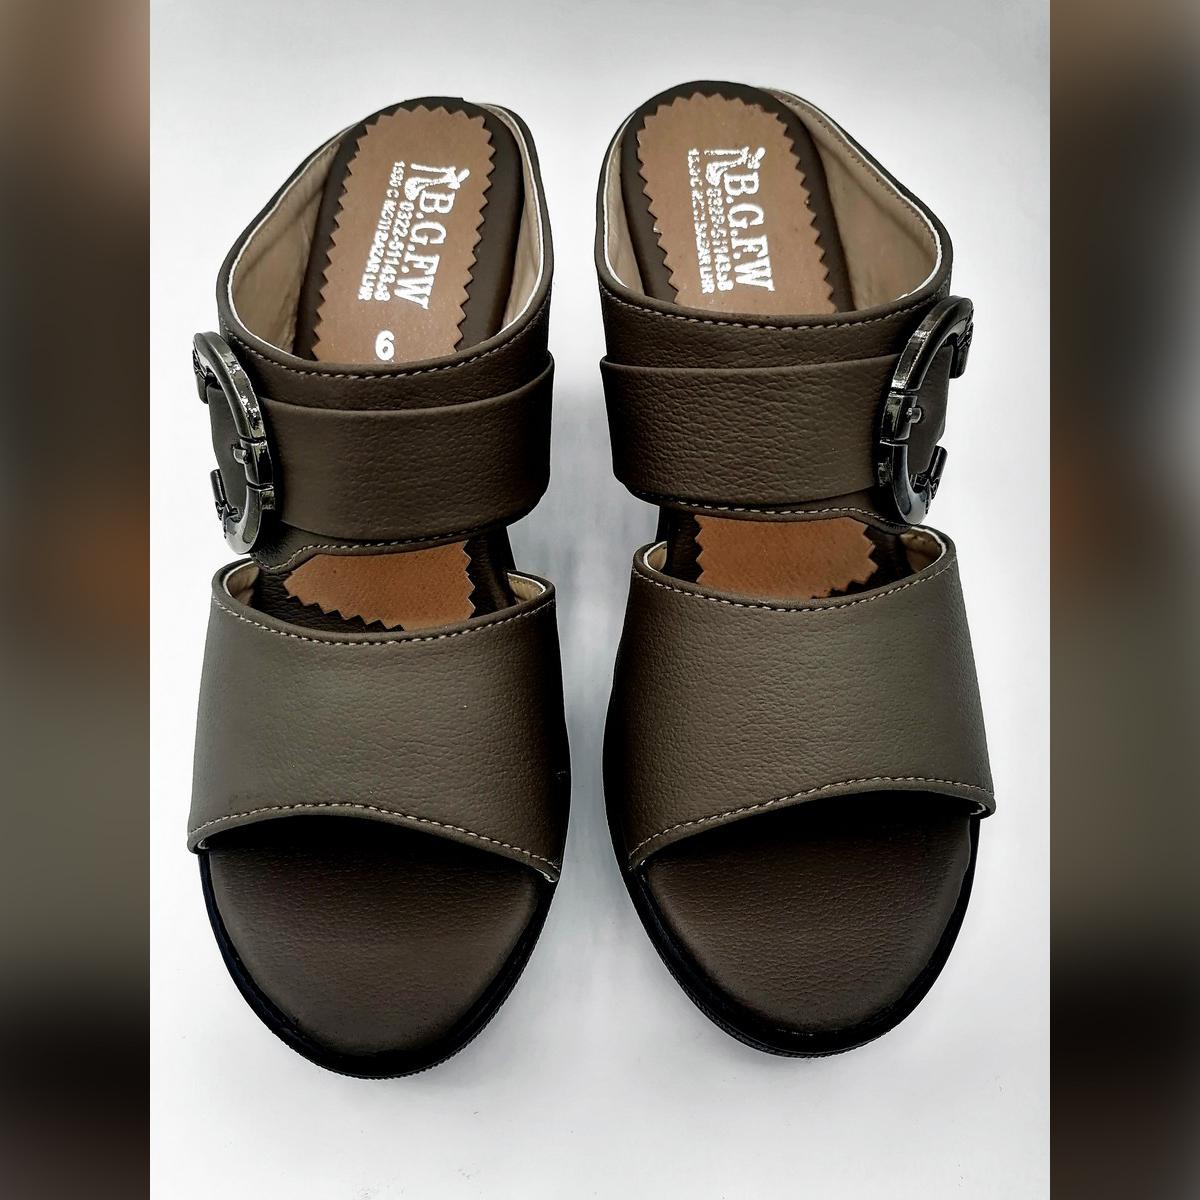 New ladies sandals for Women